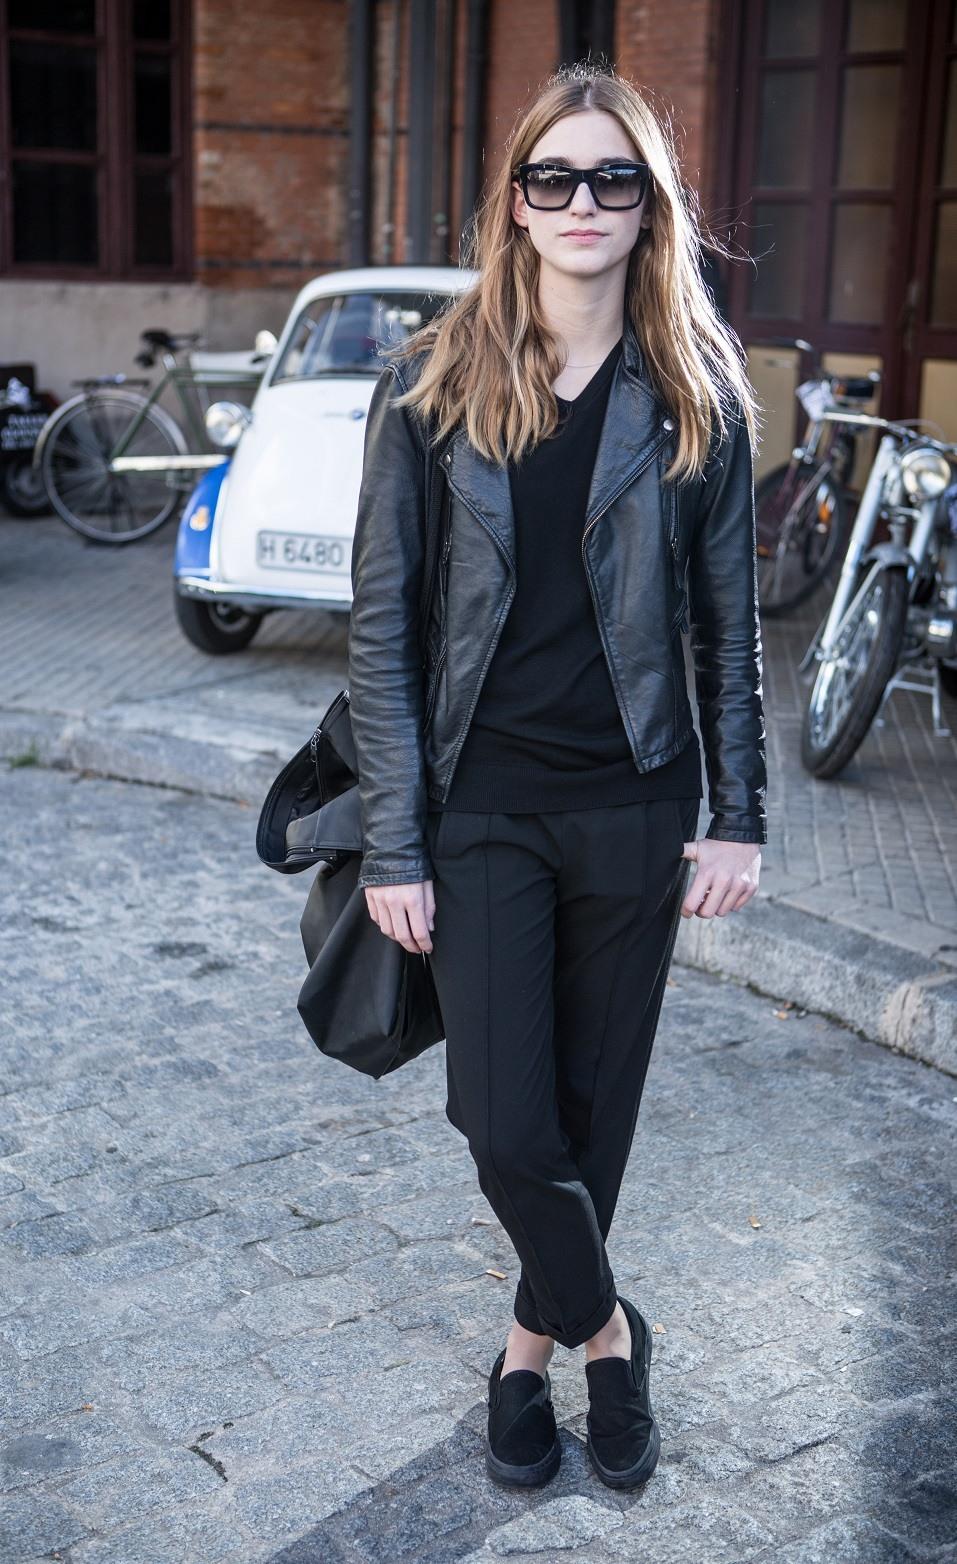 Lucia wears Vans trainers, Weekday handbag, Prada sunglasses and Zara trousers